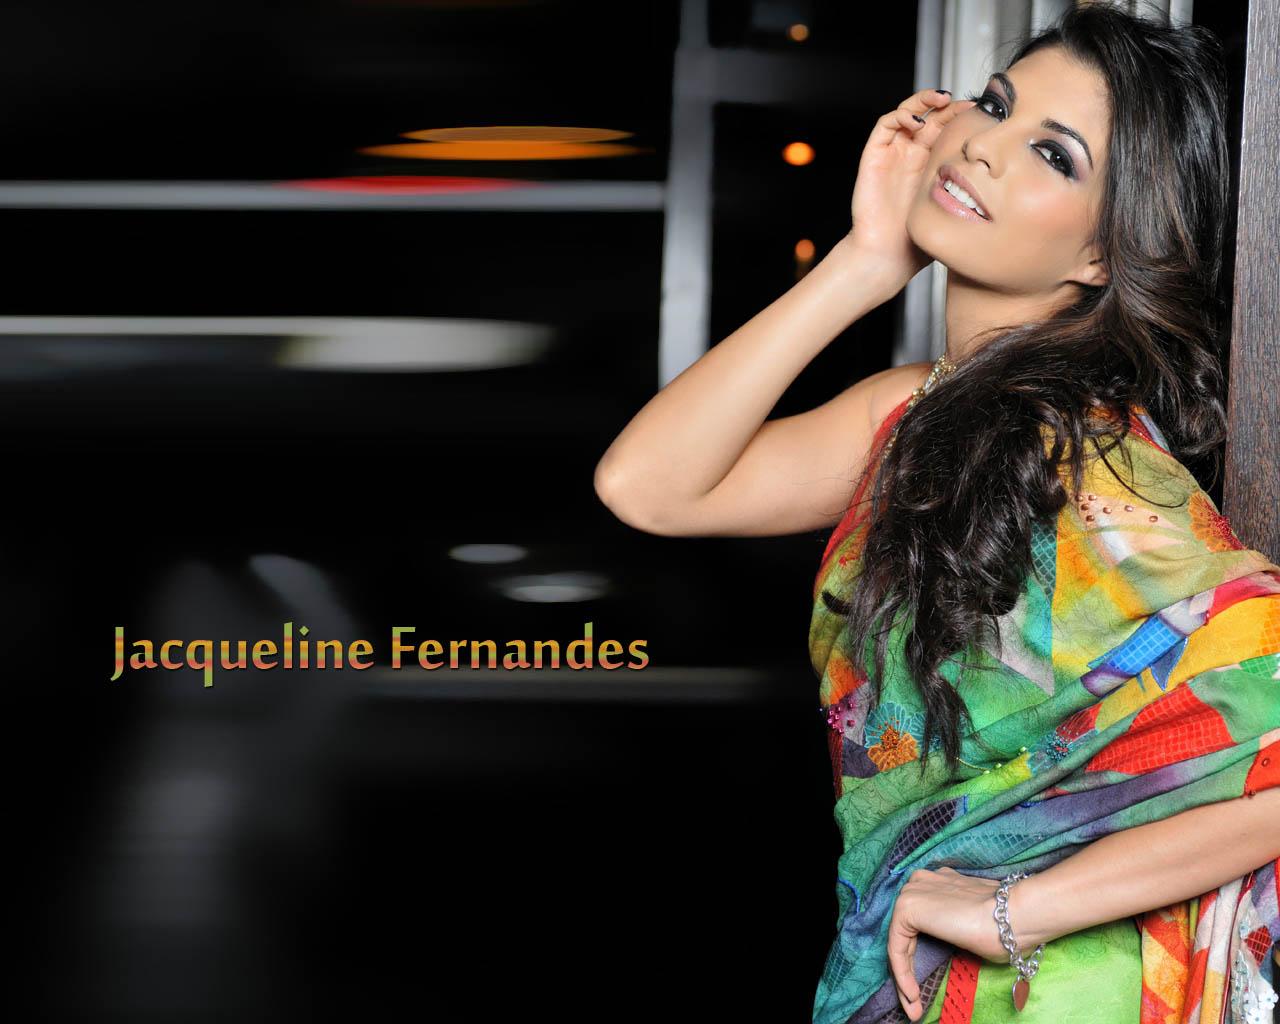 http://4.bp.blogspot.com/-Jn_EjFVkBWk/TWdVnXTV_rI/AAAAAAAAI5c/aJsAnfDXDMk/s1600/Jacqueline+Fernandes+Hottest+Pictures+Gallery-2.jpg